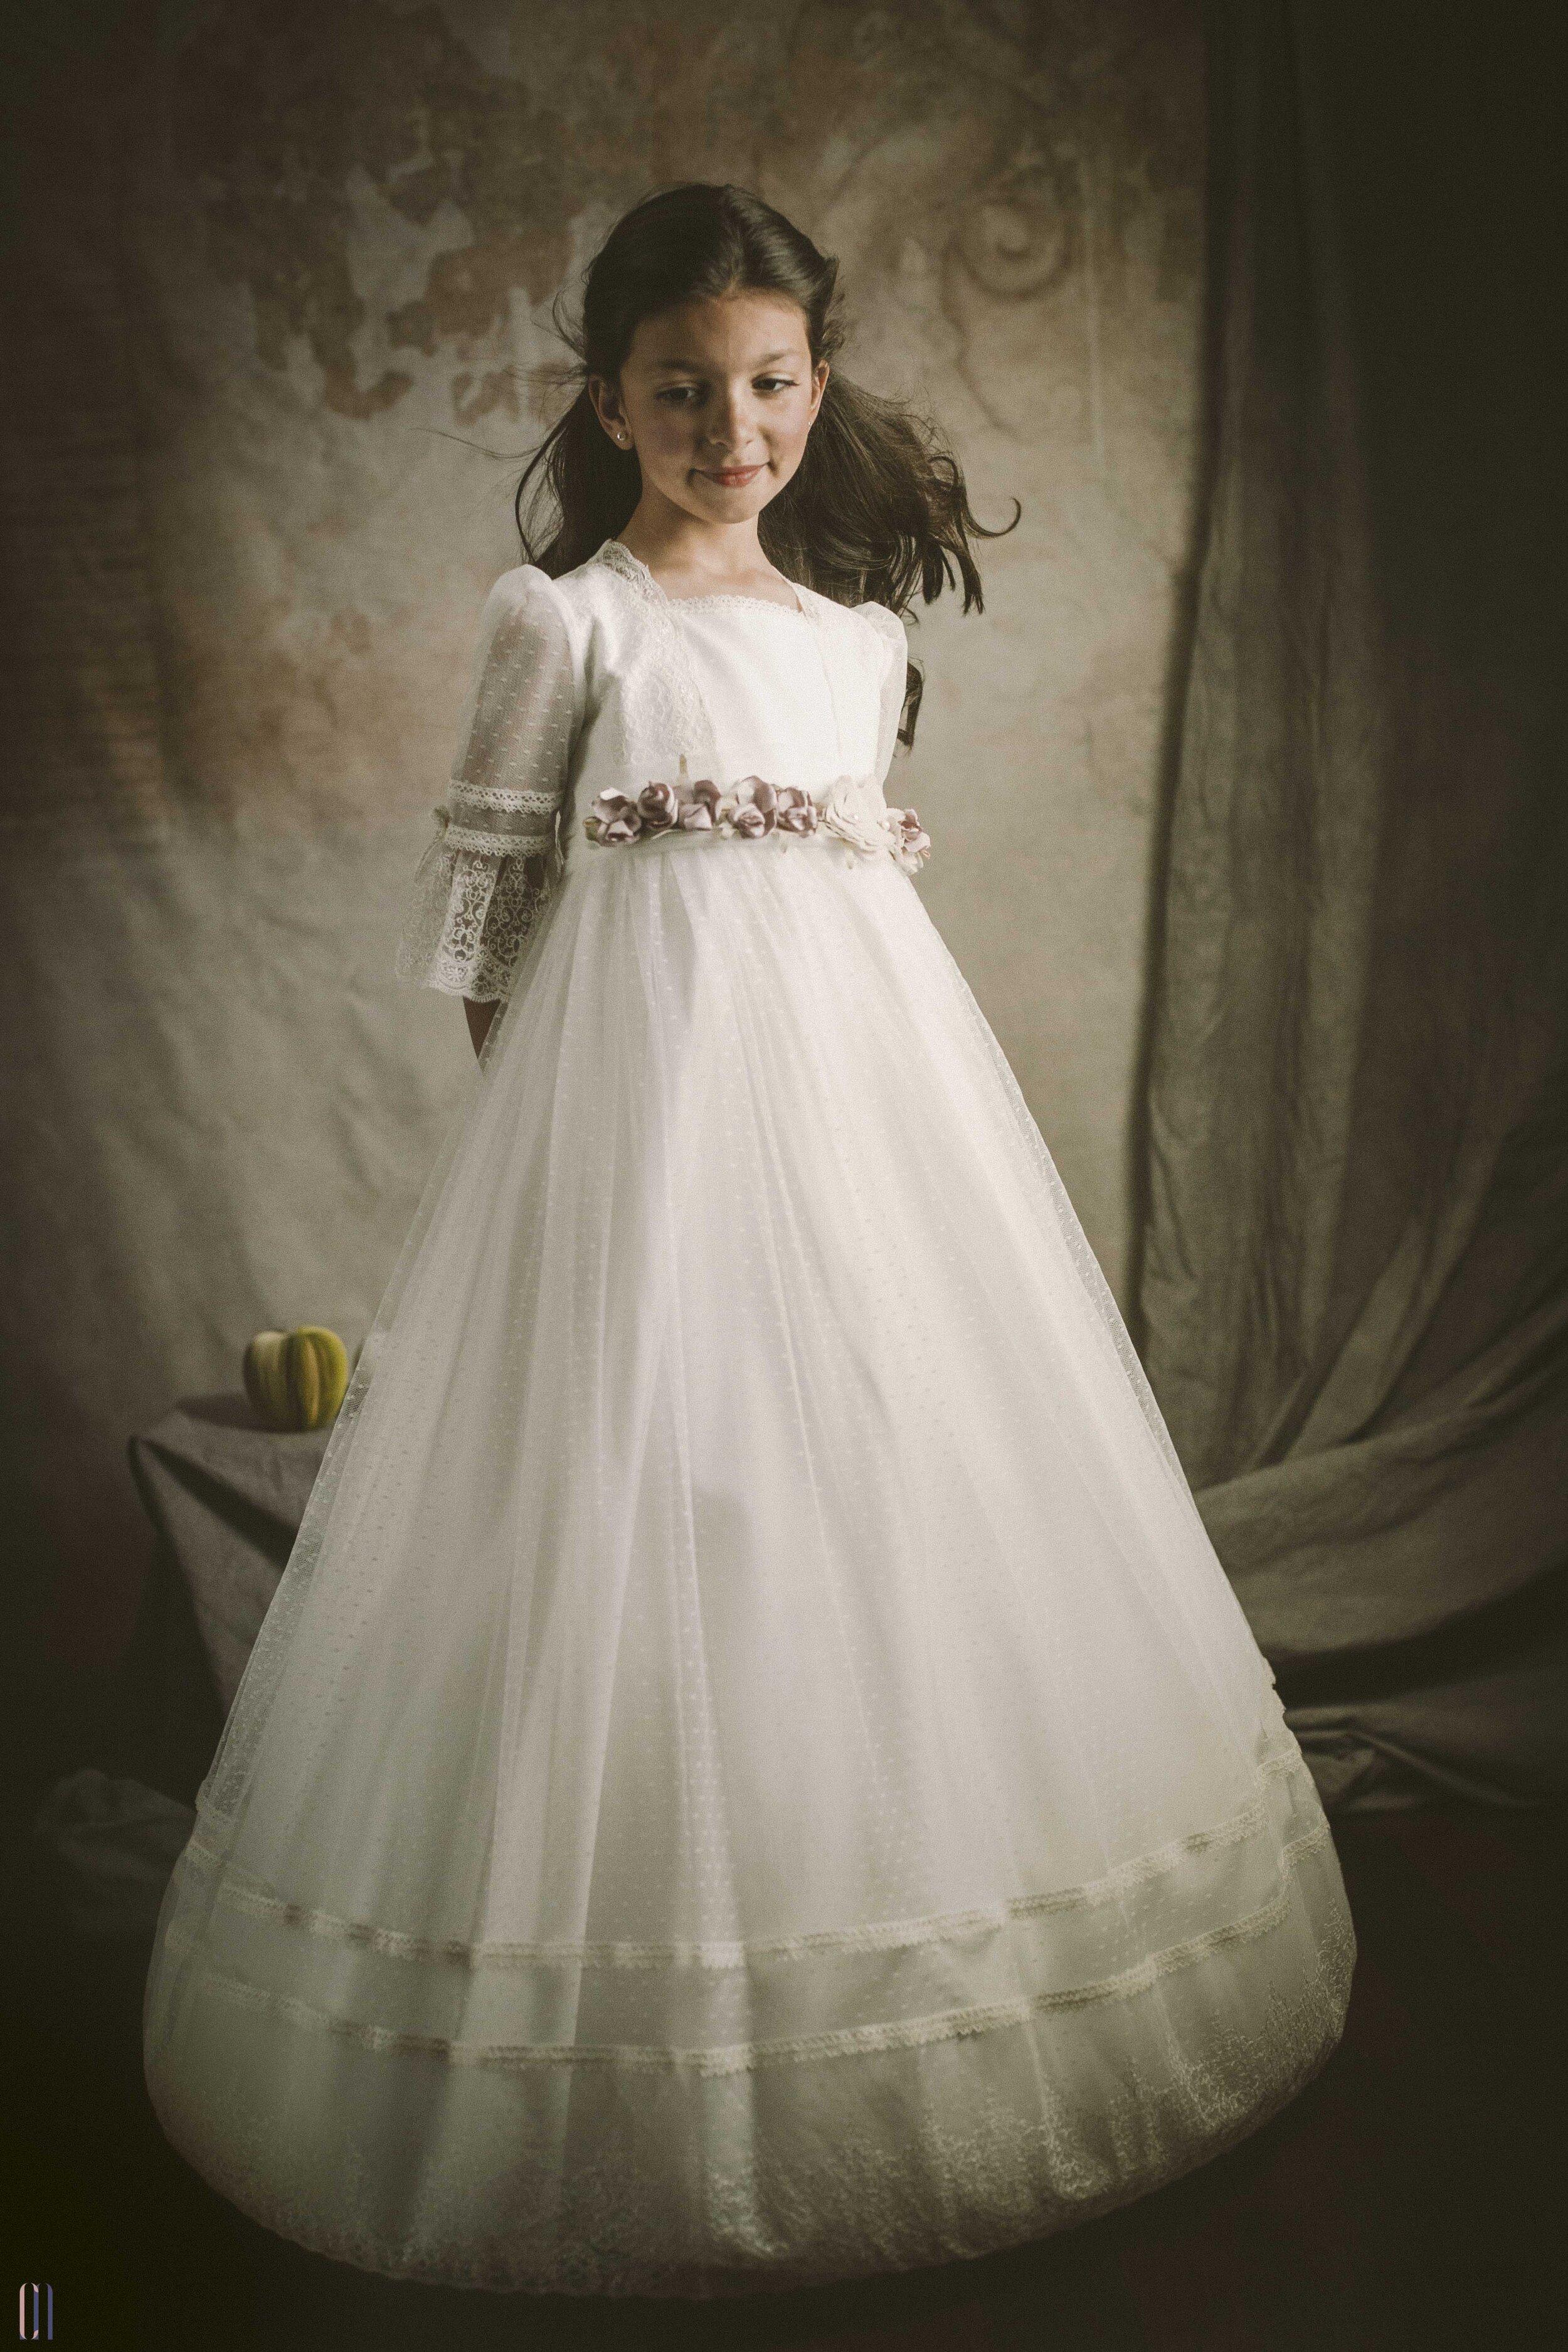 alejandra vestida de comunion-1.jpg